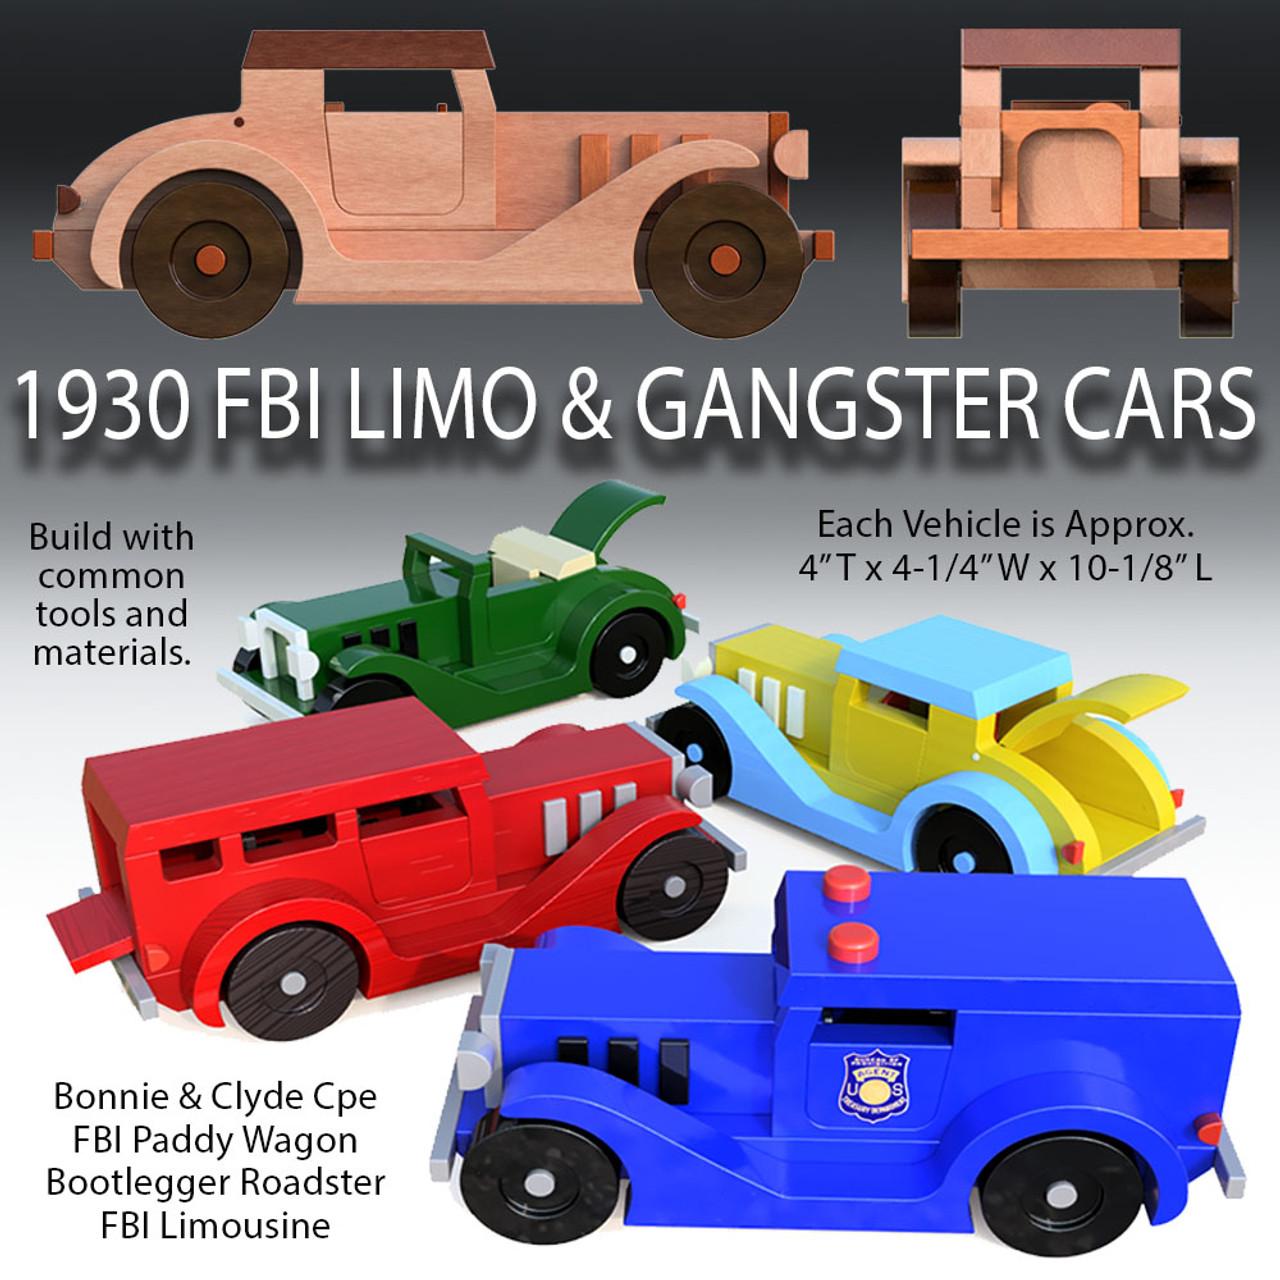 1930 fbi limo & gangster cars wood toy plans (4 pdf downloads)